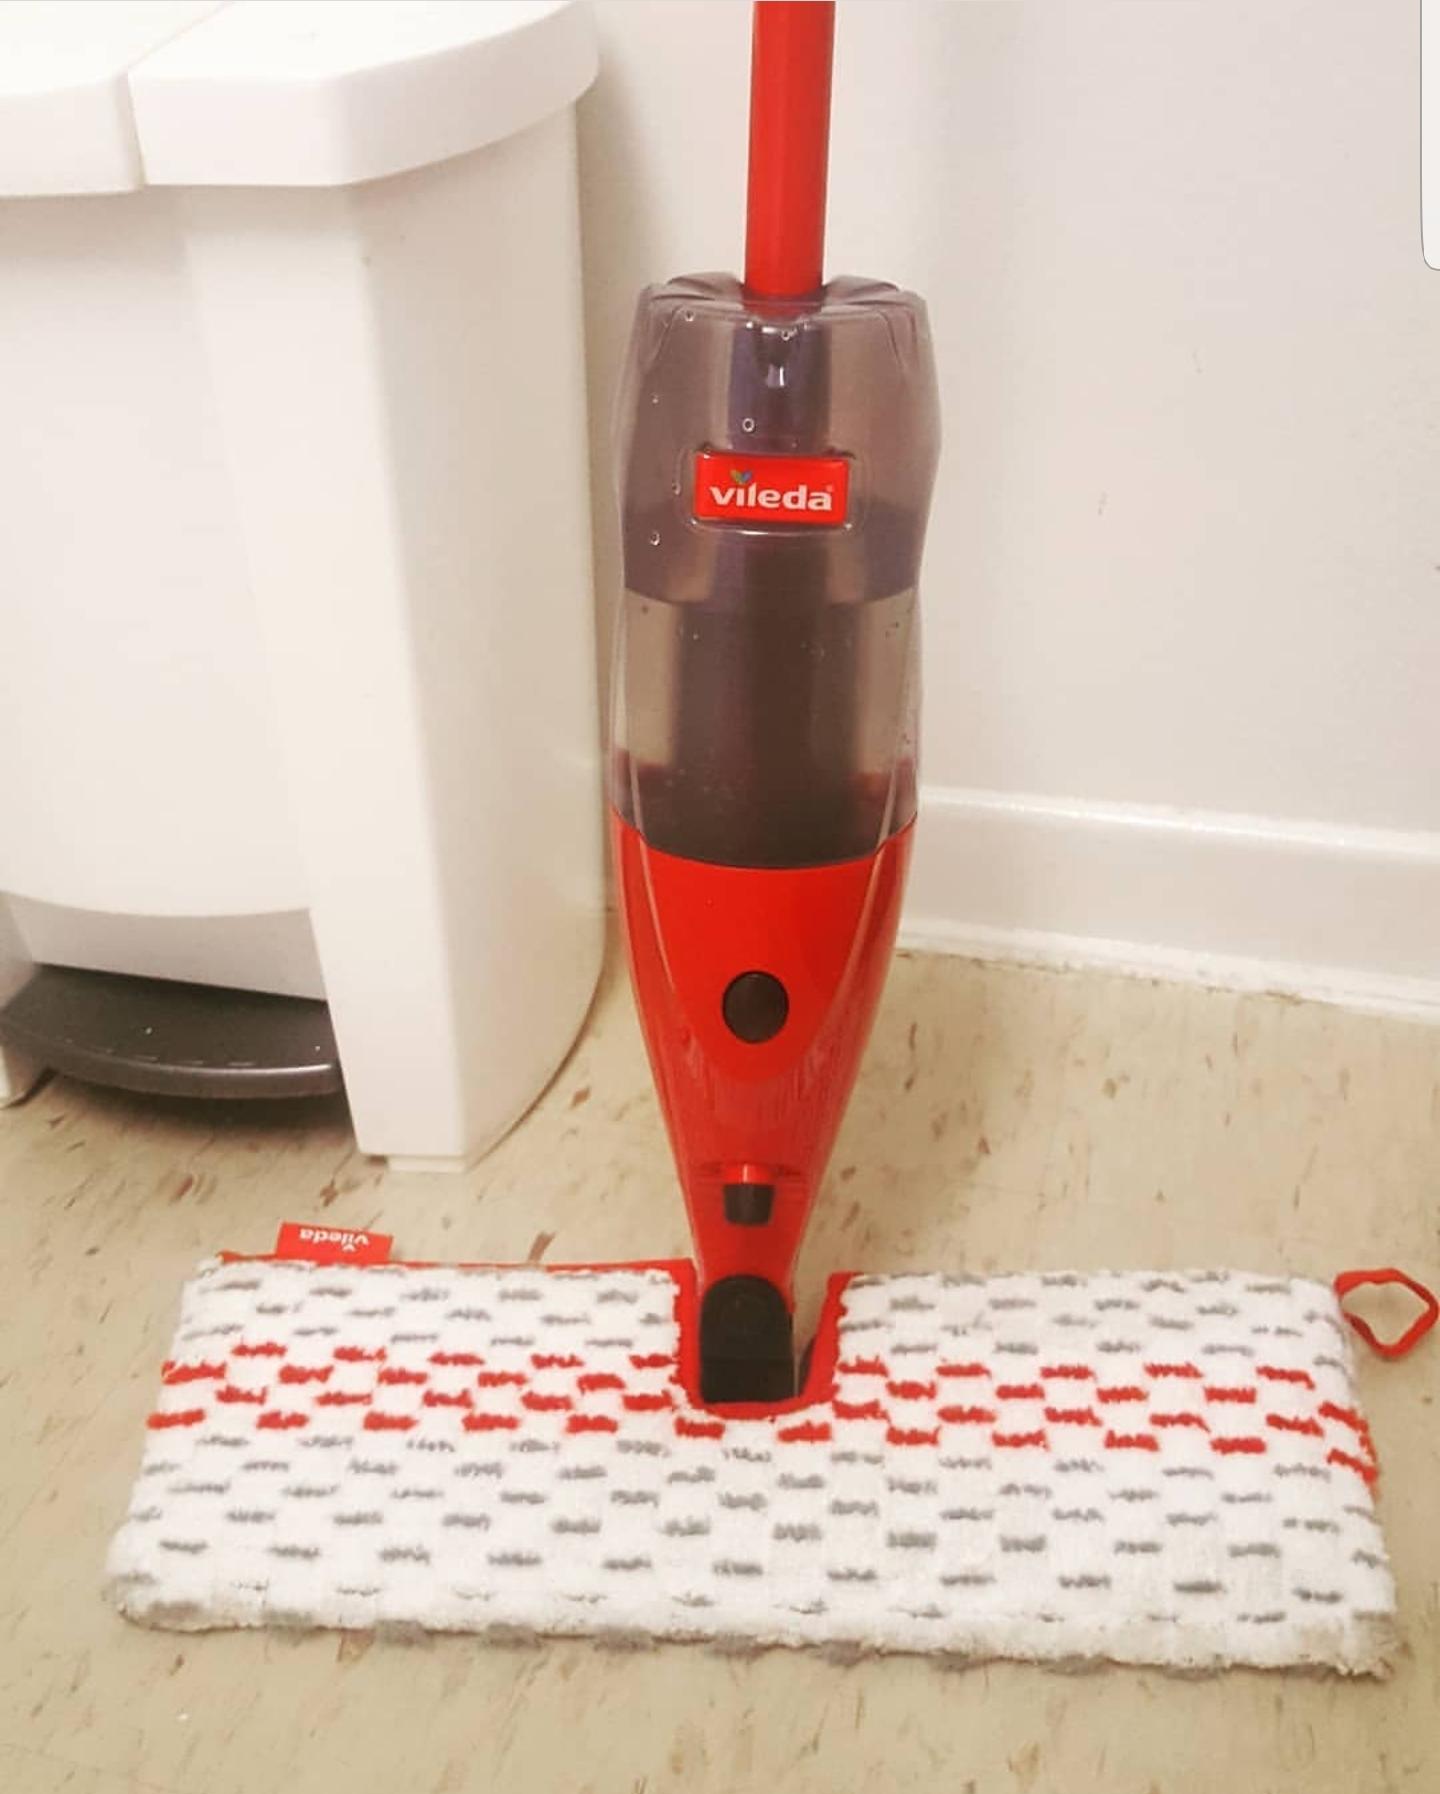 Vileda Promist Max Spray Mop Reviews In Household Cleaning